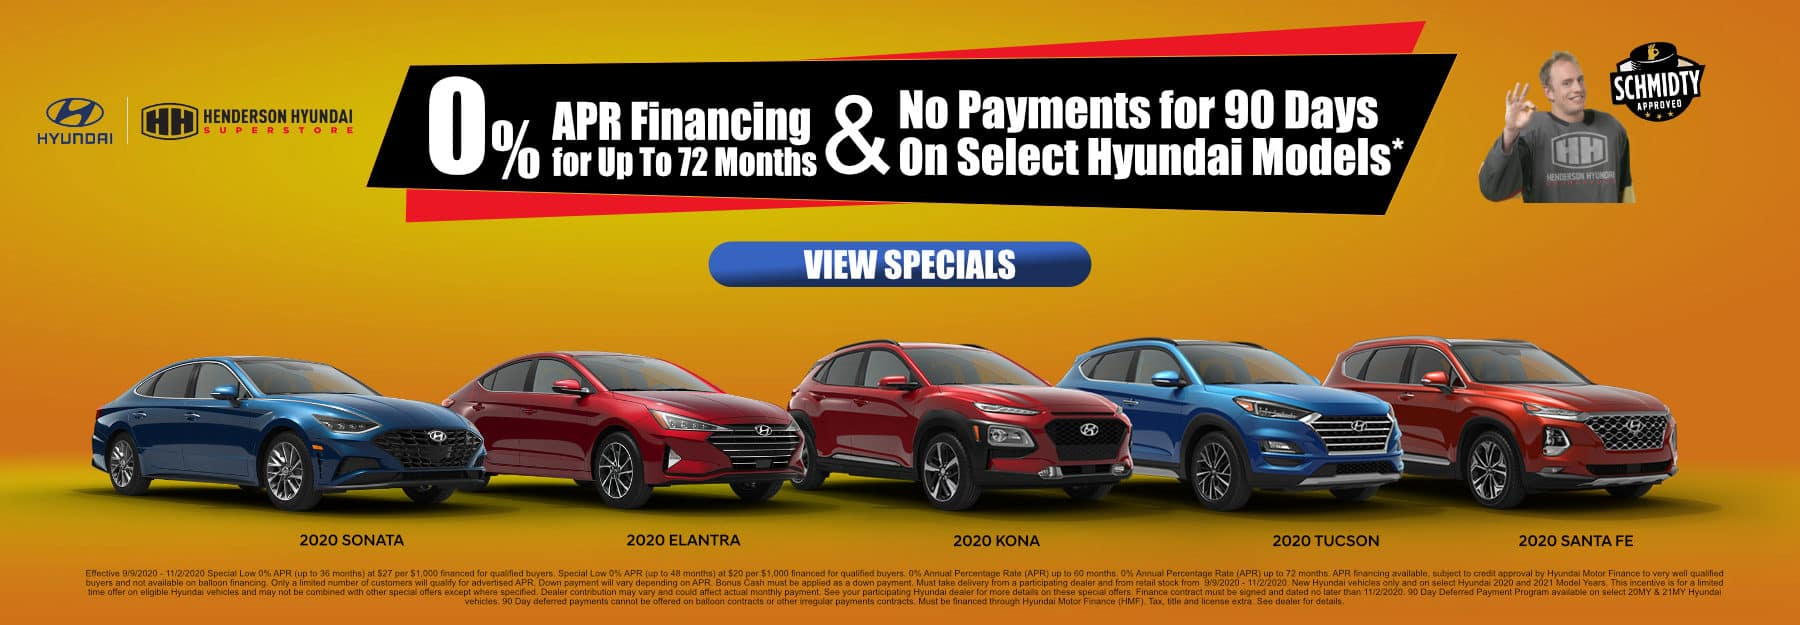 September-2020_0APR_Financing_Henderson Hyundai